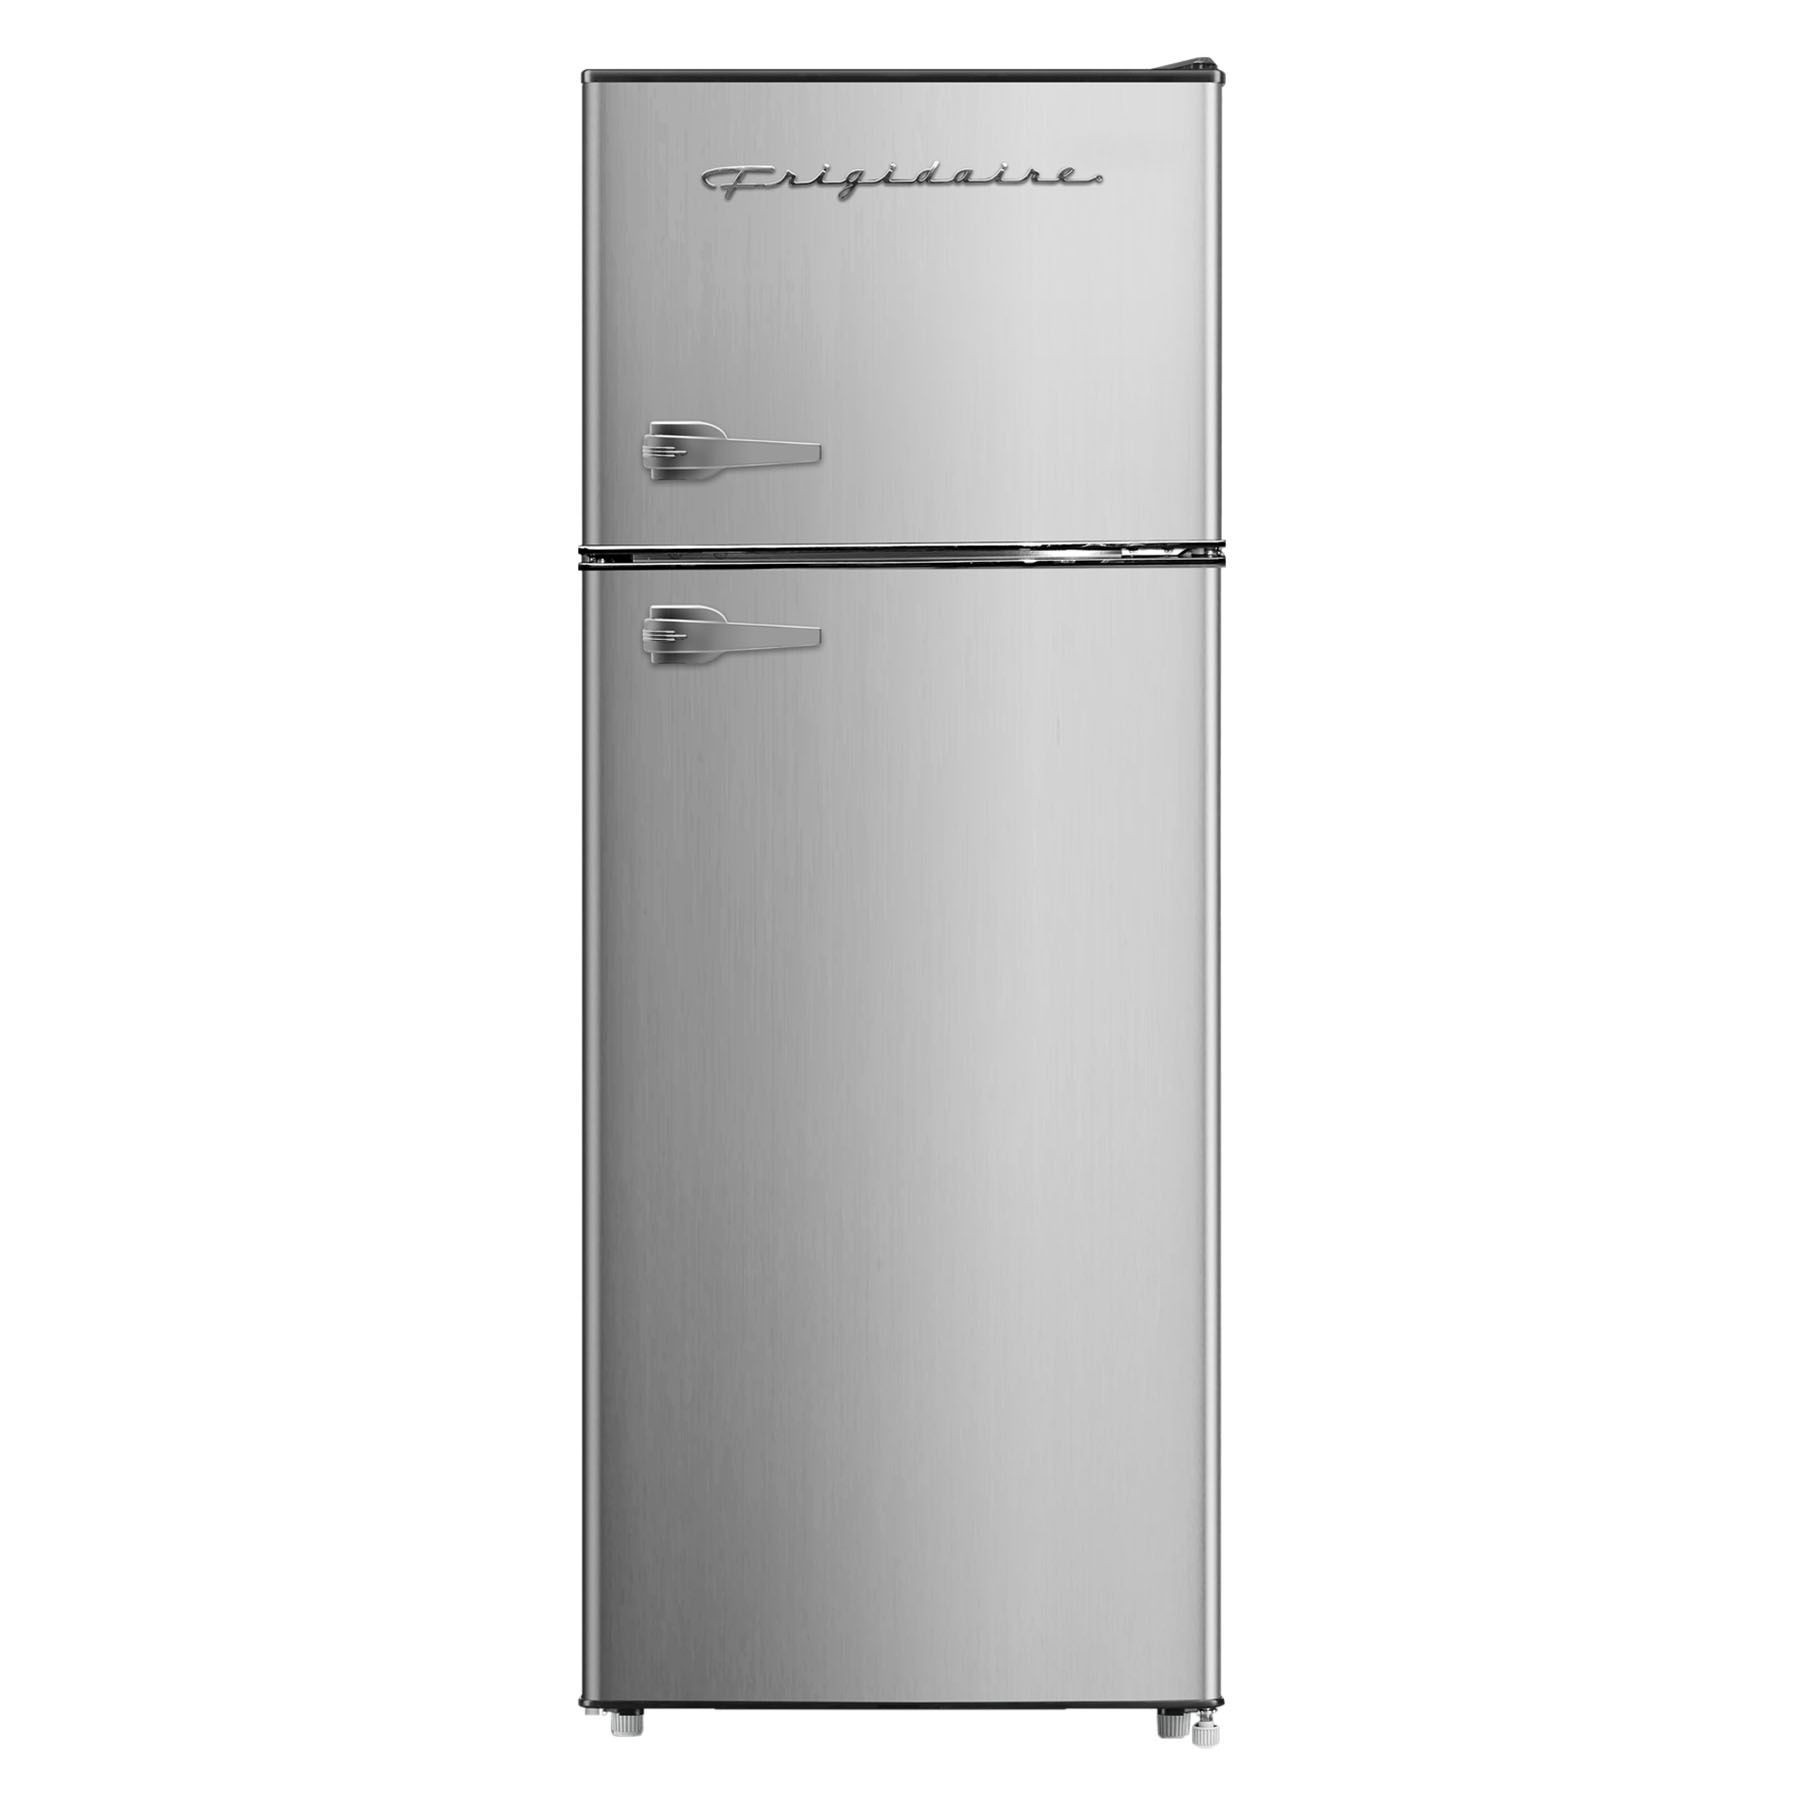 5 Pallets of Small Appliances, Outdoor Décor, TV Accessories & More, Good/Fair, Ext. Retail $8,093, Uxbridge, MA